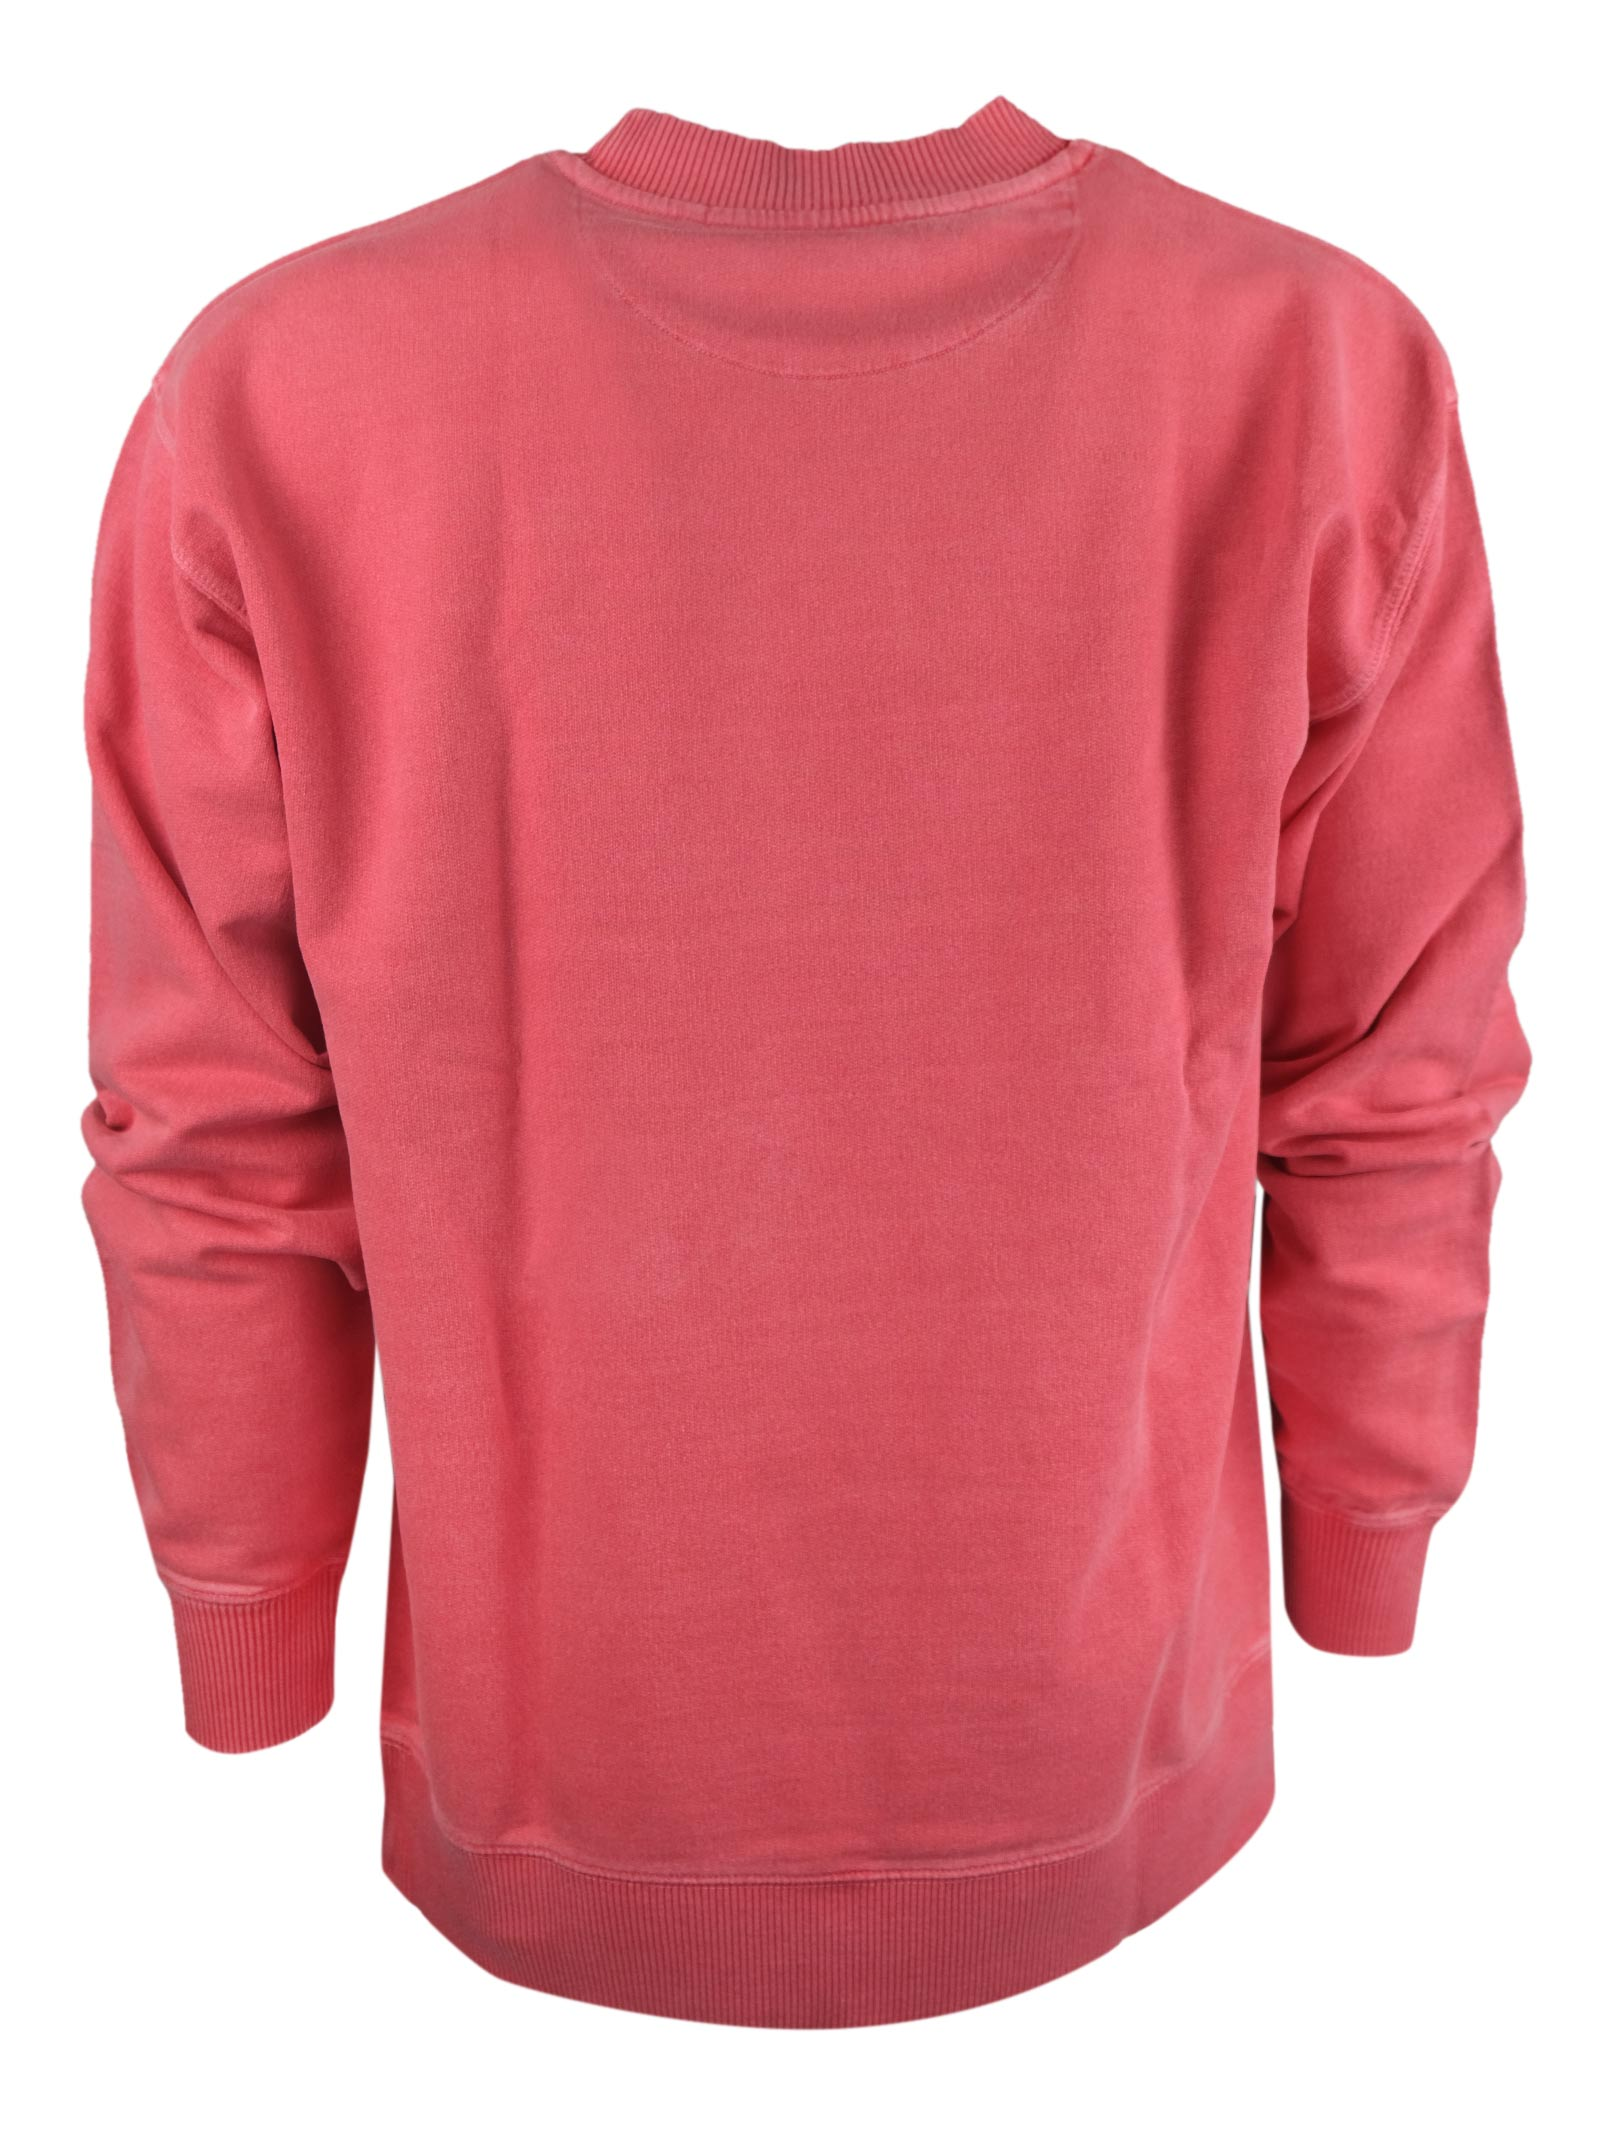 Crew neck sweater GANT | Sweats | 2046081622